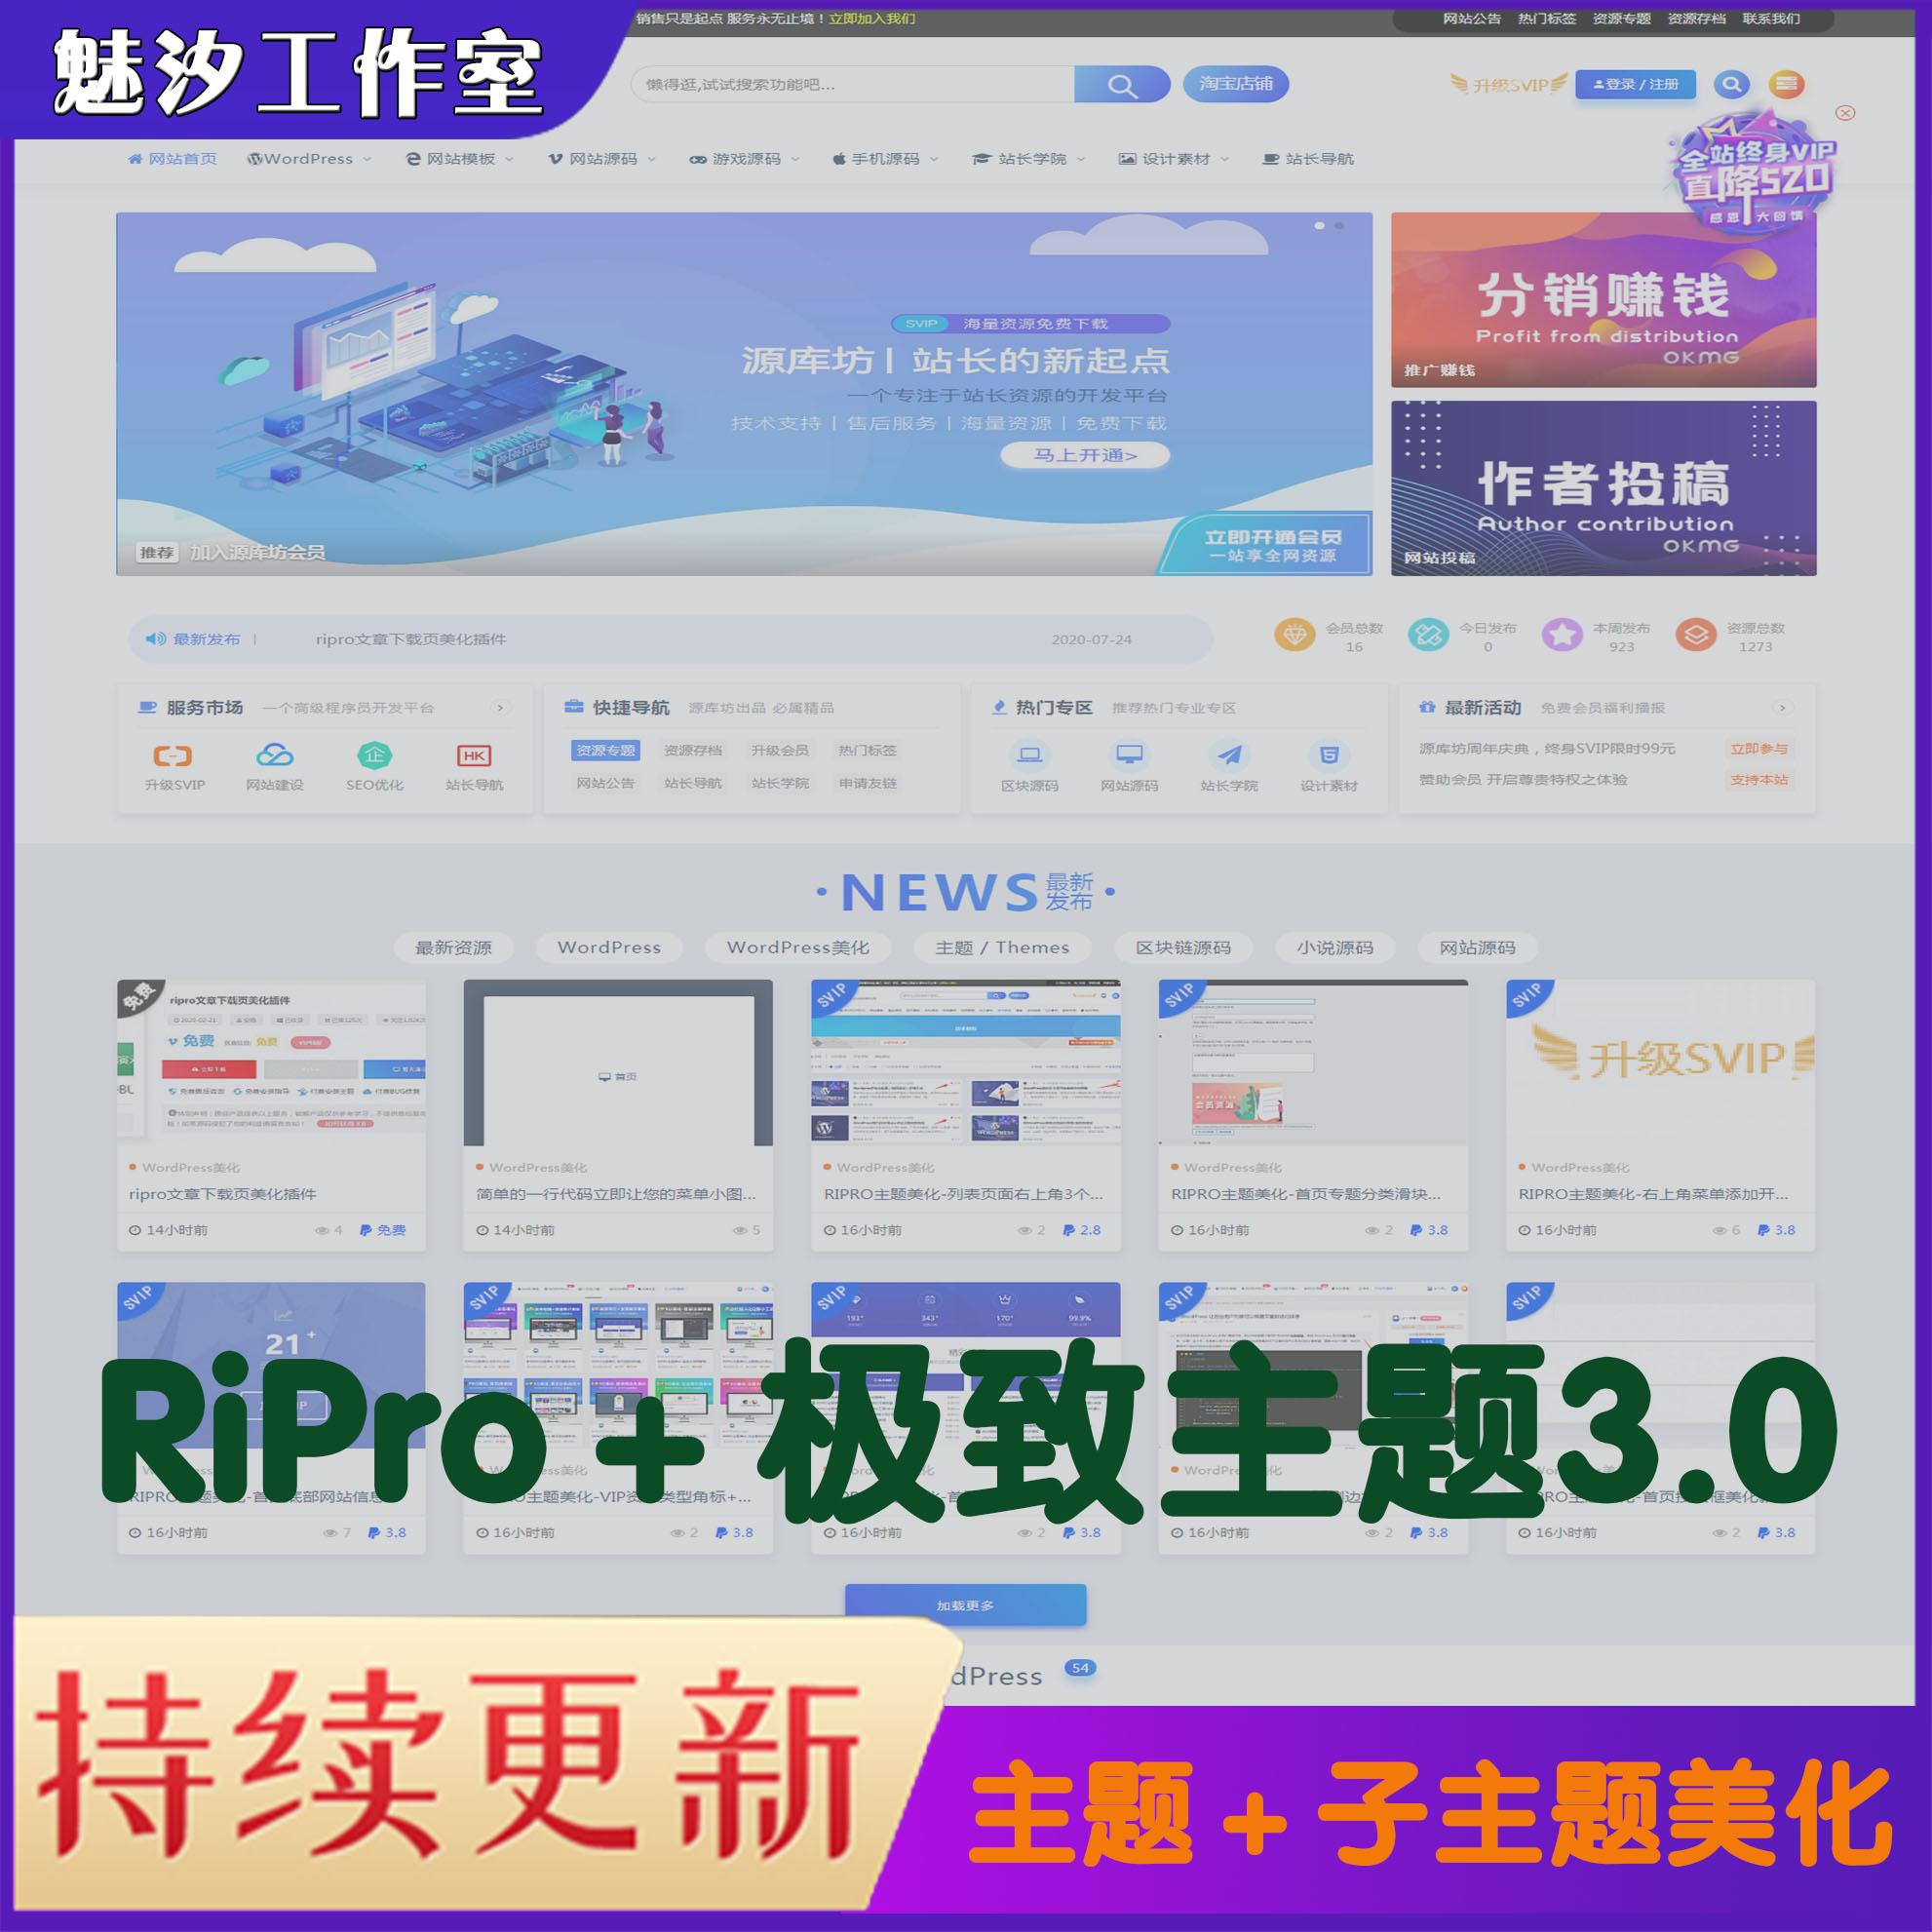 Wordpress主题Ripro美化站壳子主题3.0赠原ripro6.9主题素材源码